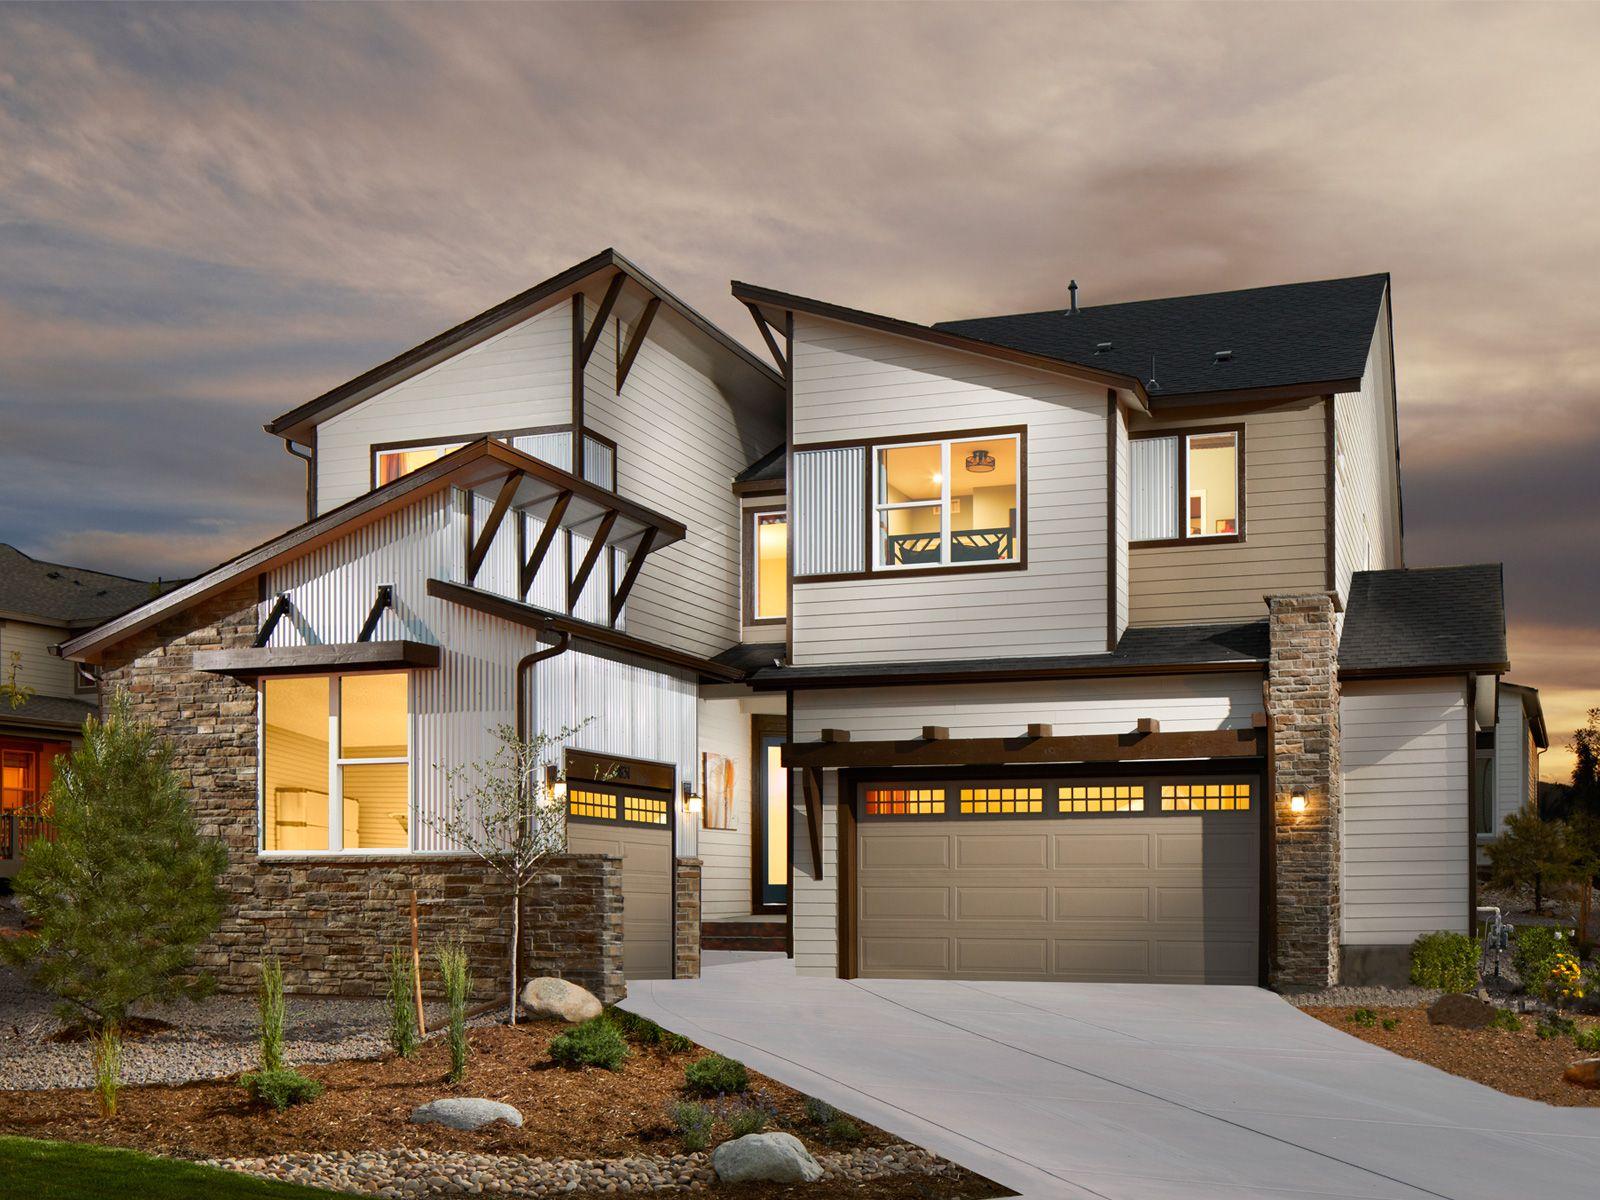 Single Family for Sale at The Apex 9527 Palmer Lake Avenue Littleton, Colorado 80125 United States